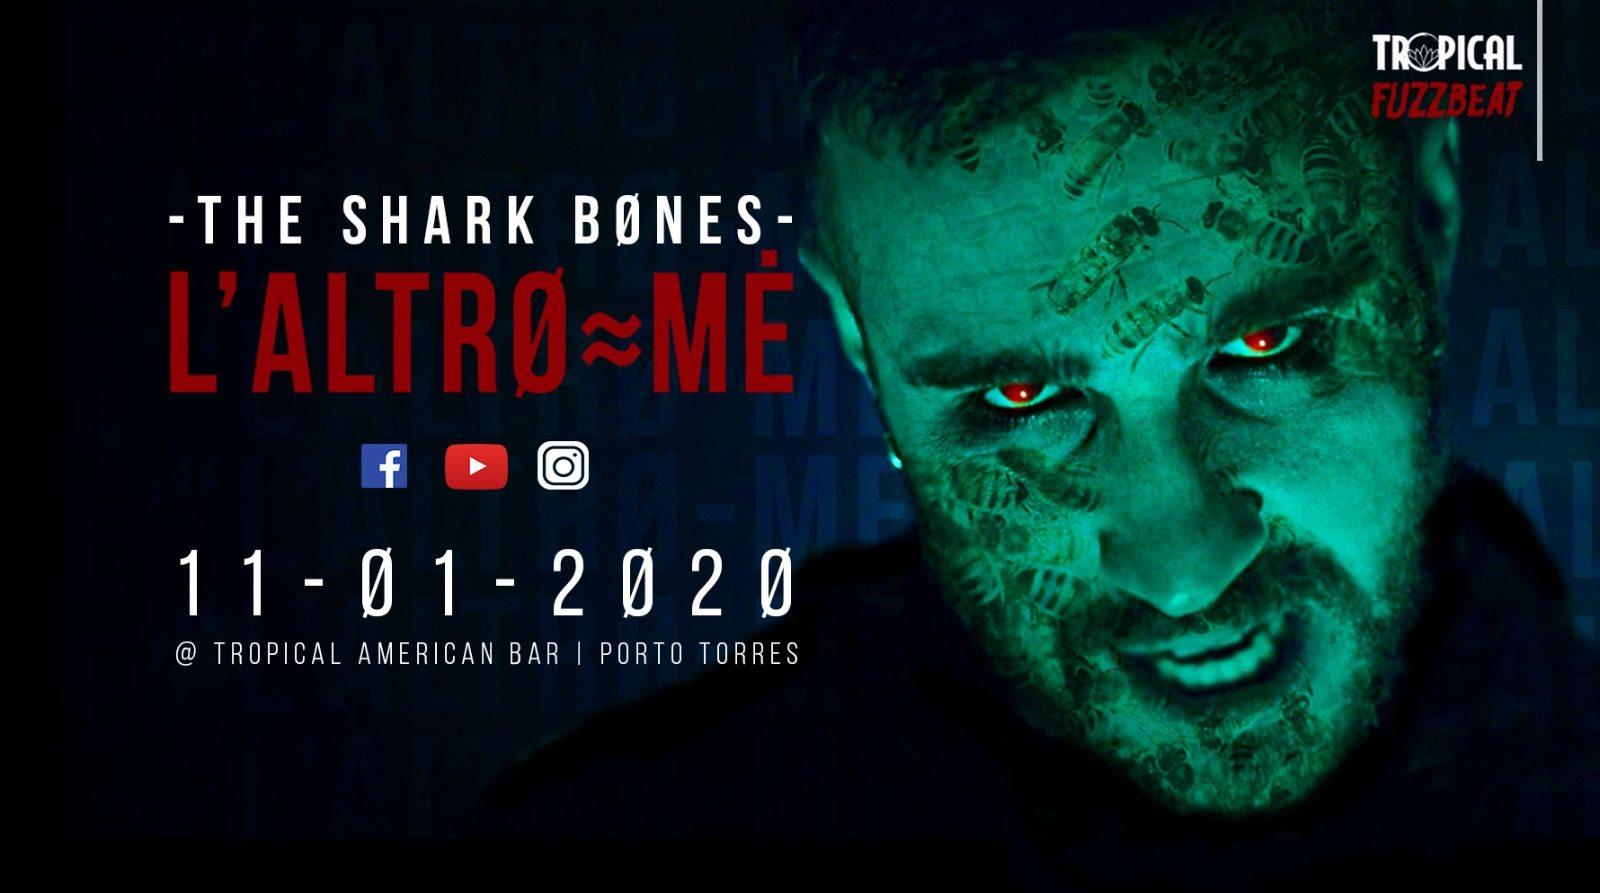 Fuzzbeat - The Shark Bones - Tropical American Bar - Porto Torres - 11 gennaio 2020 - eventi - 2020 - Sa Scena Sarda